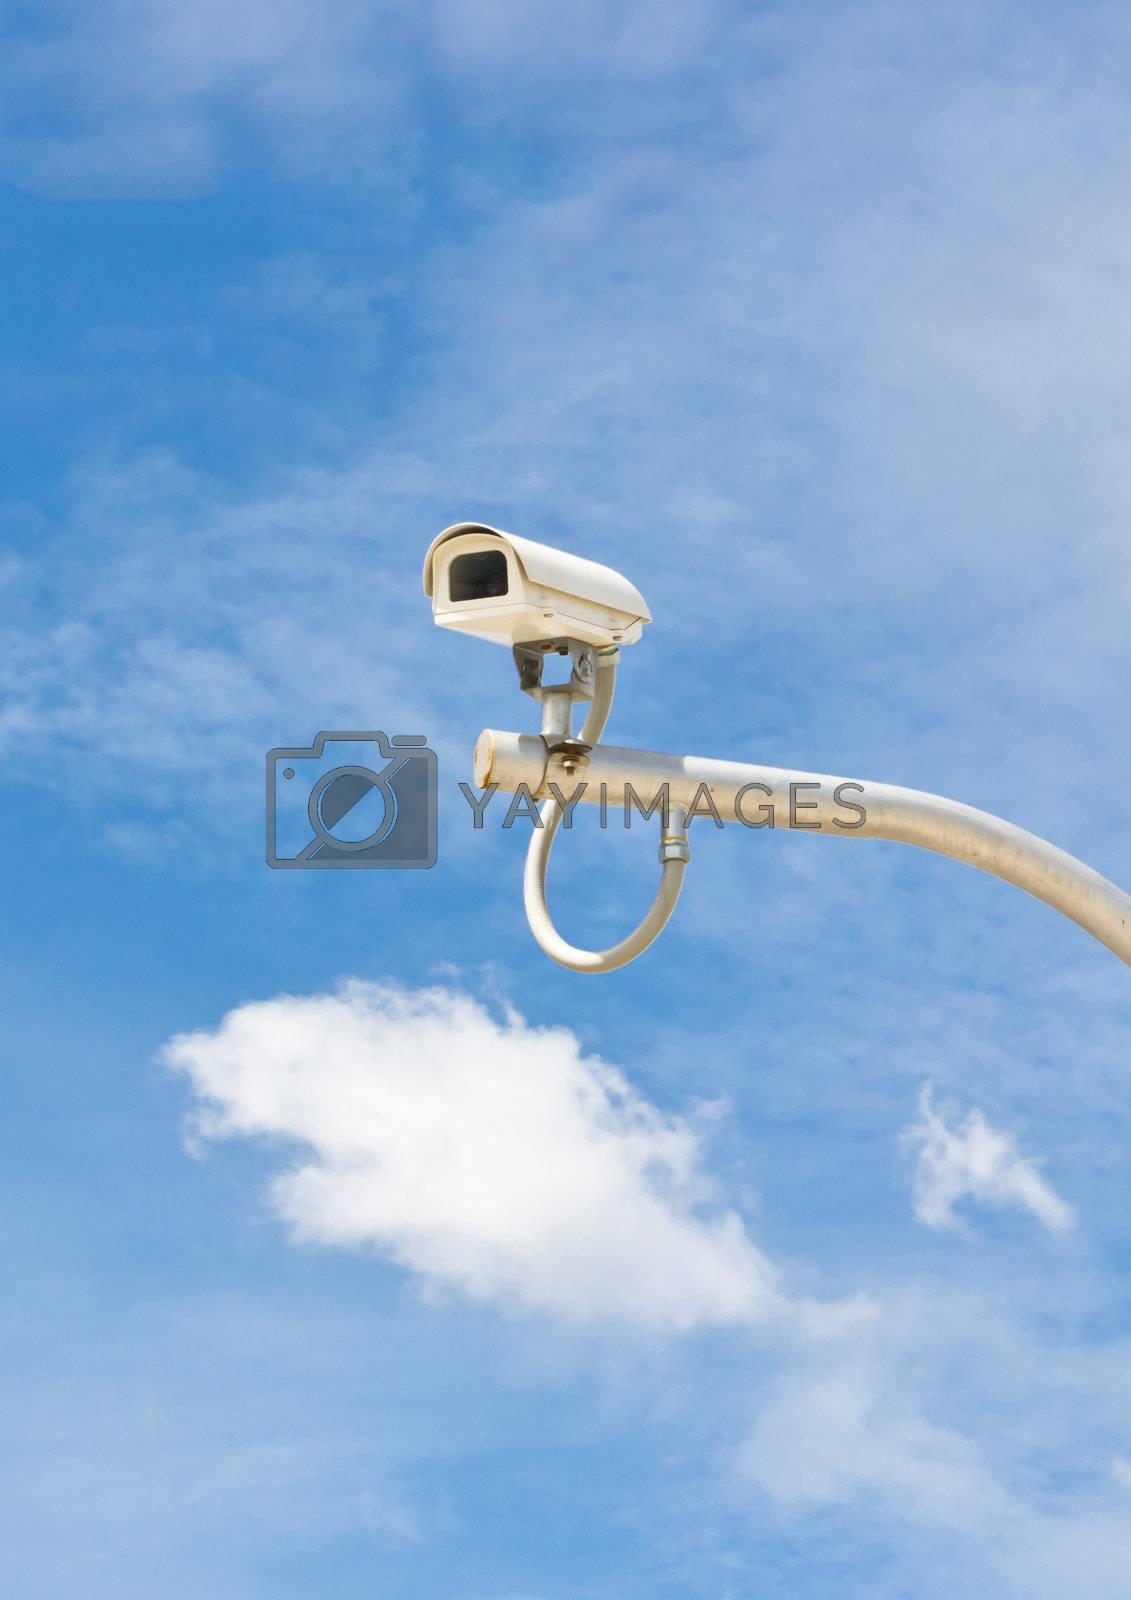 outdoor security cctv camera against blue sky